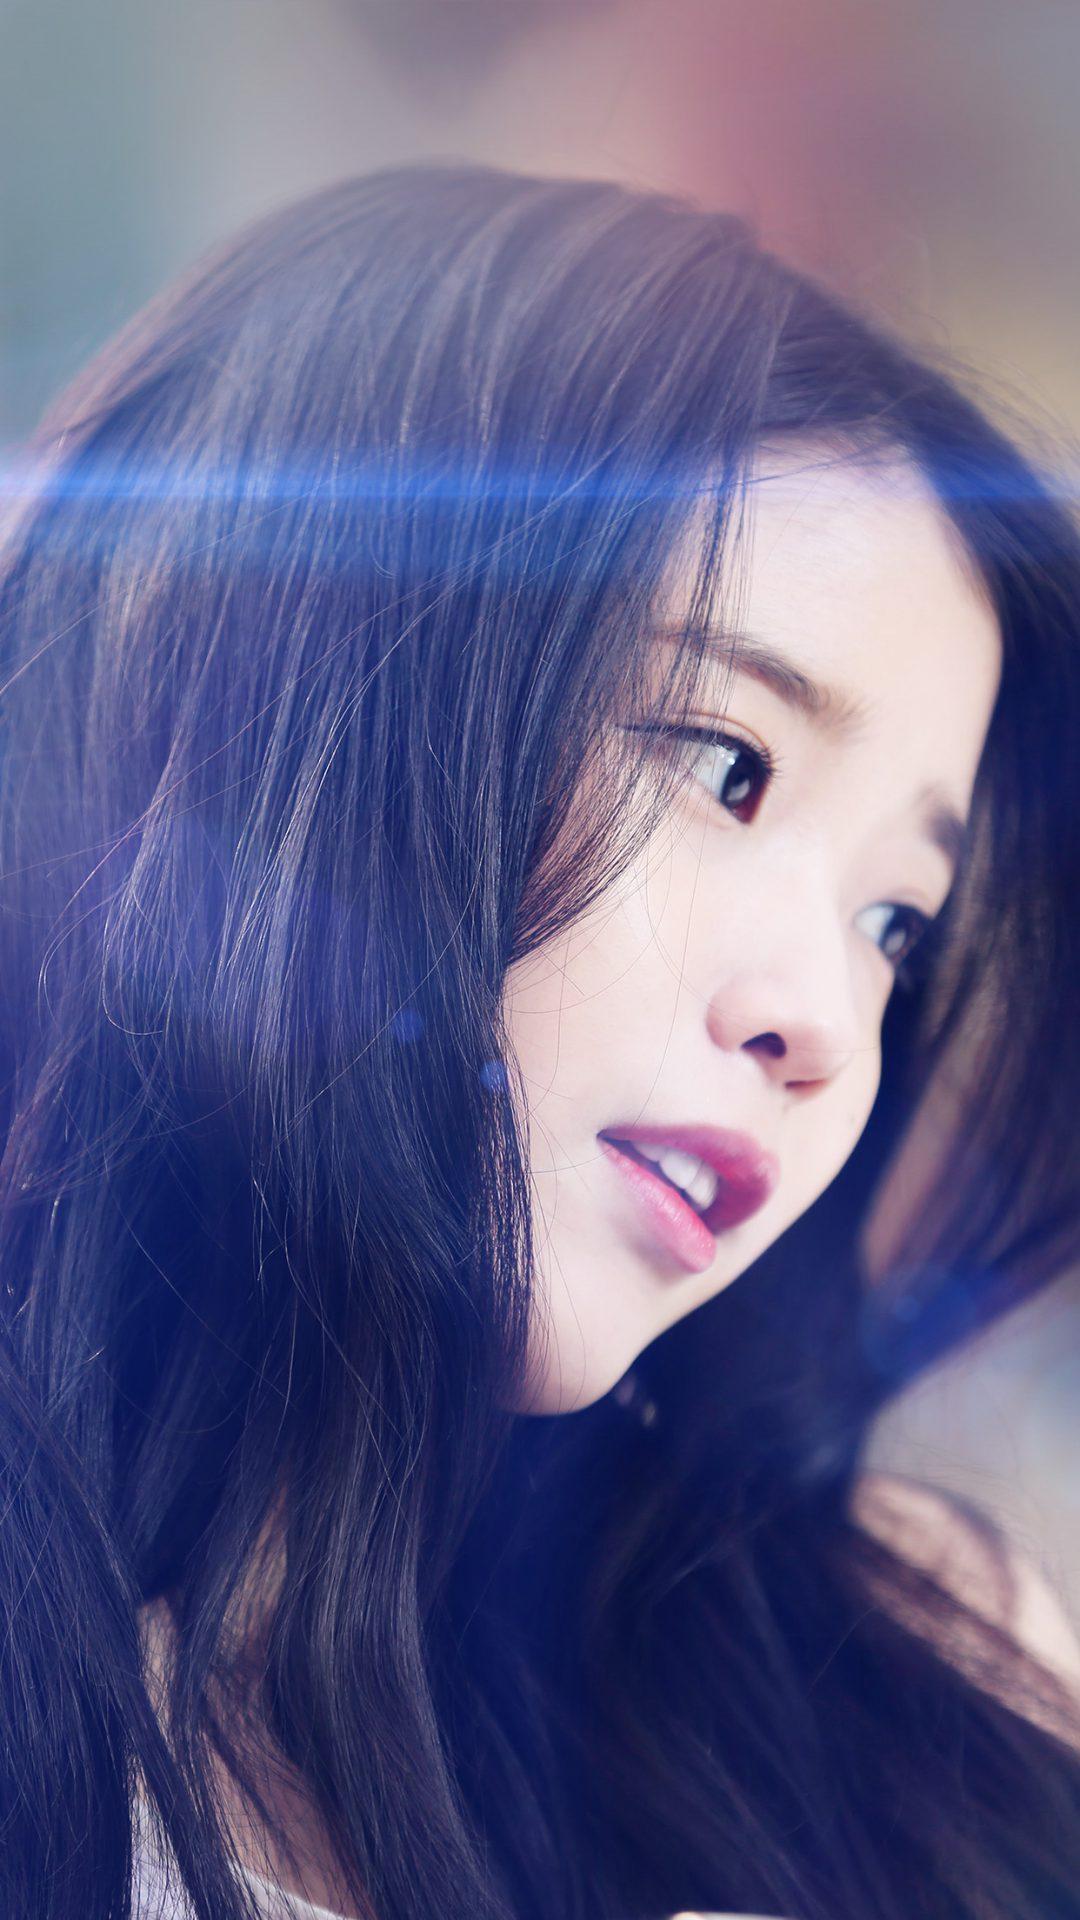 Iu Kpop Beauty Girl Singer Blue Flare